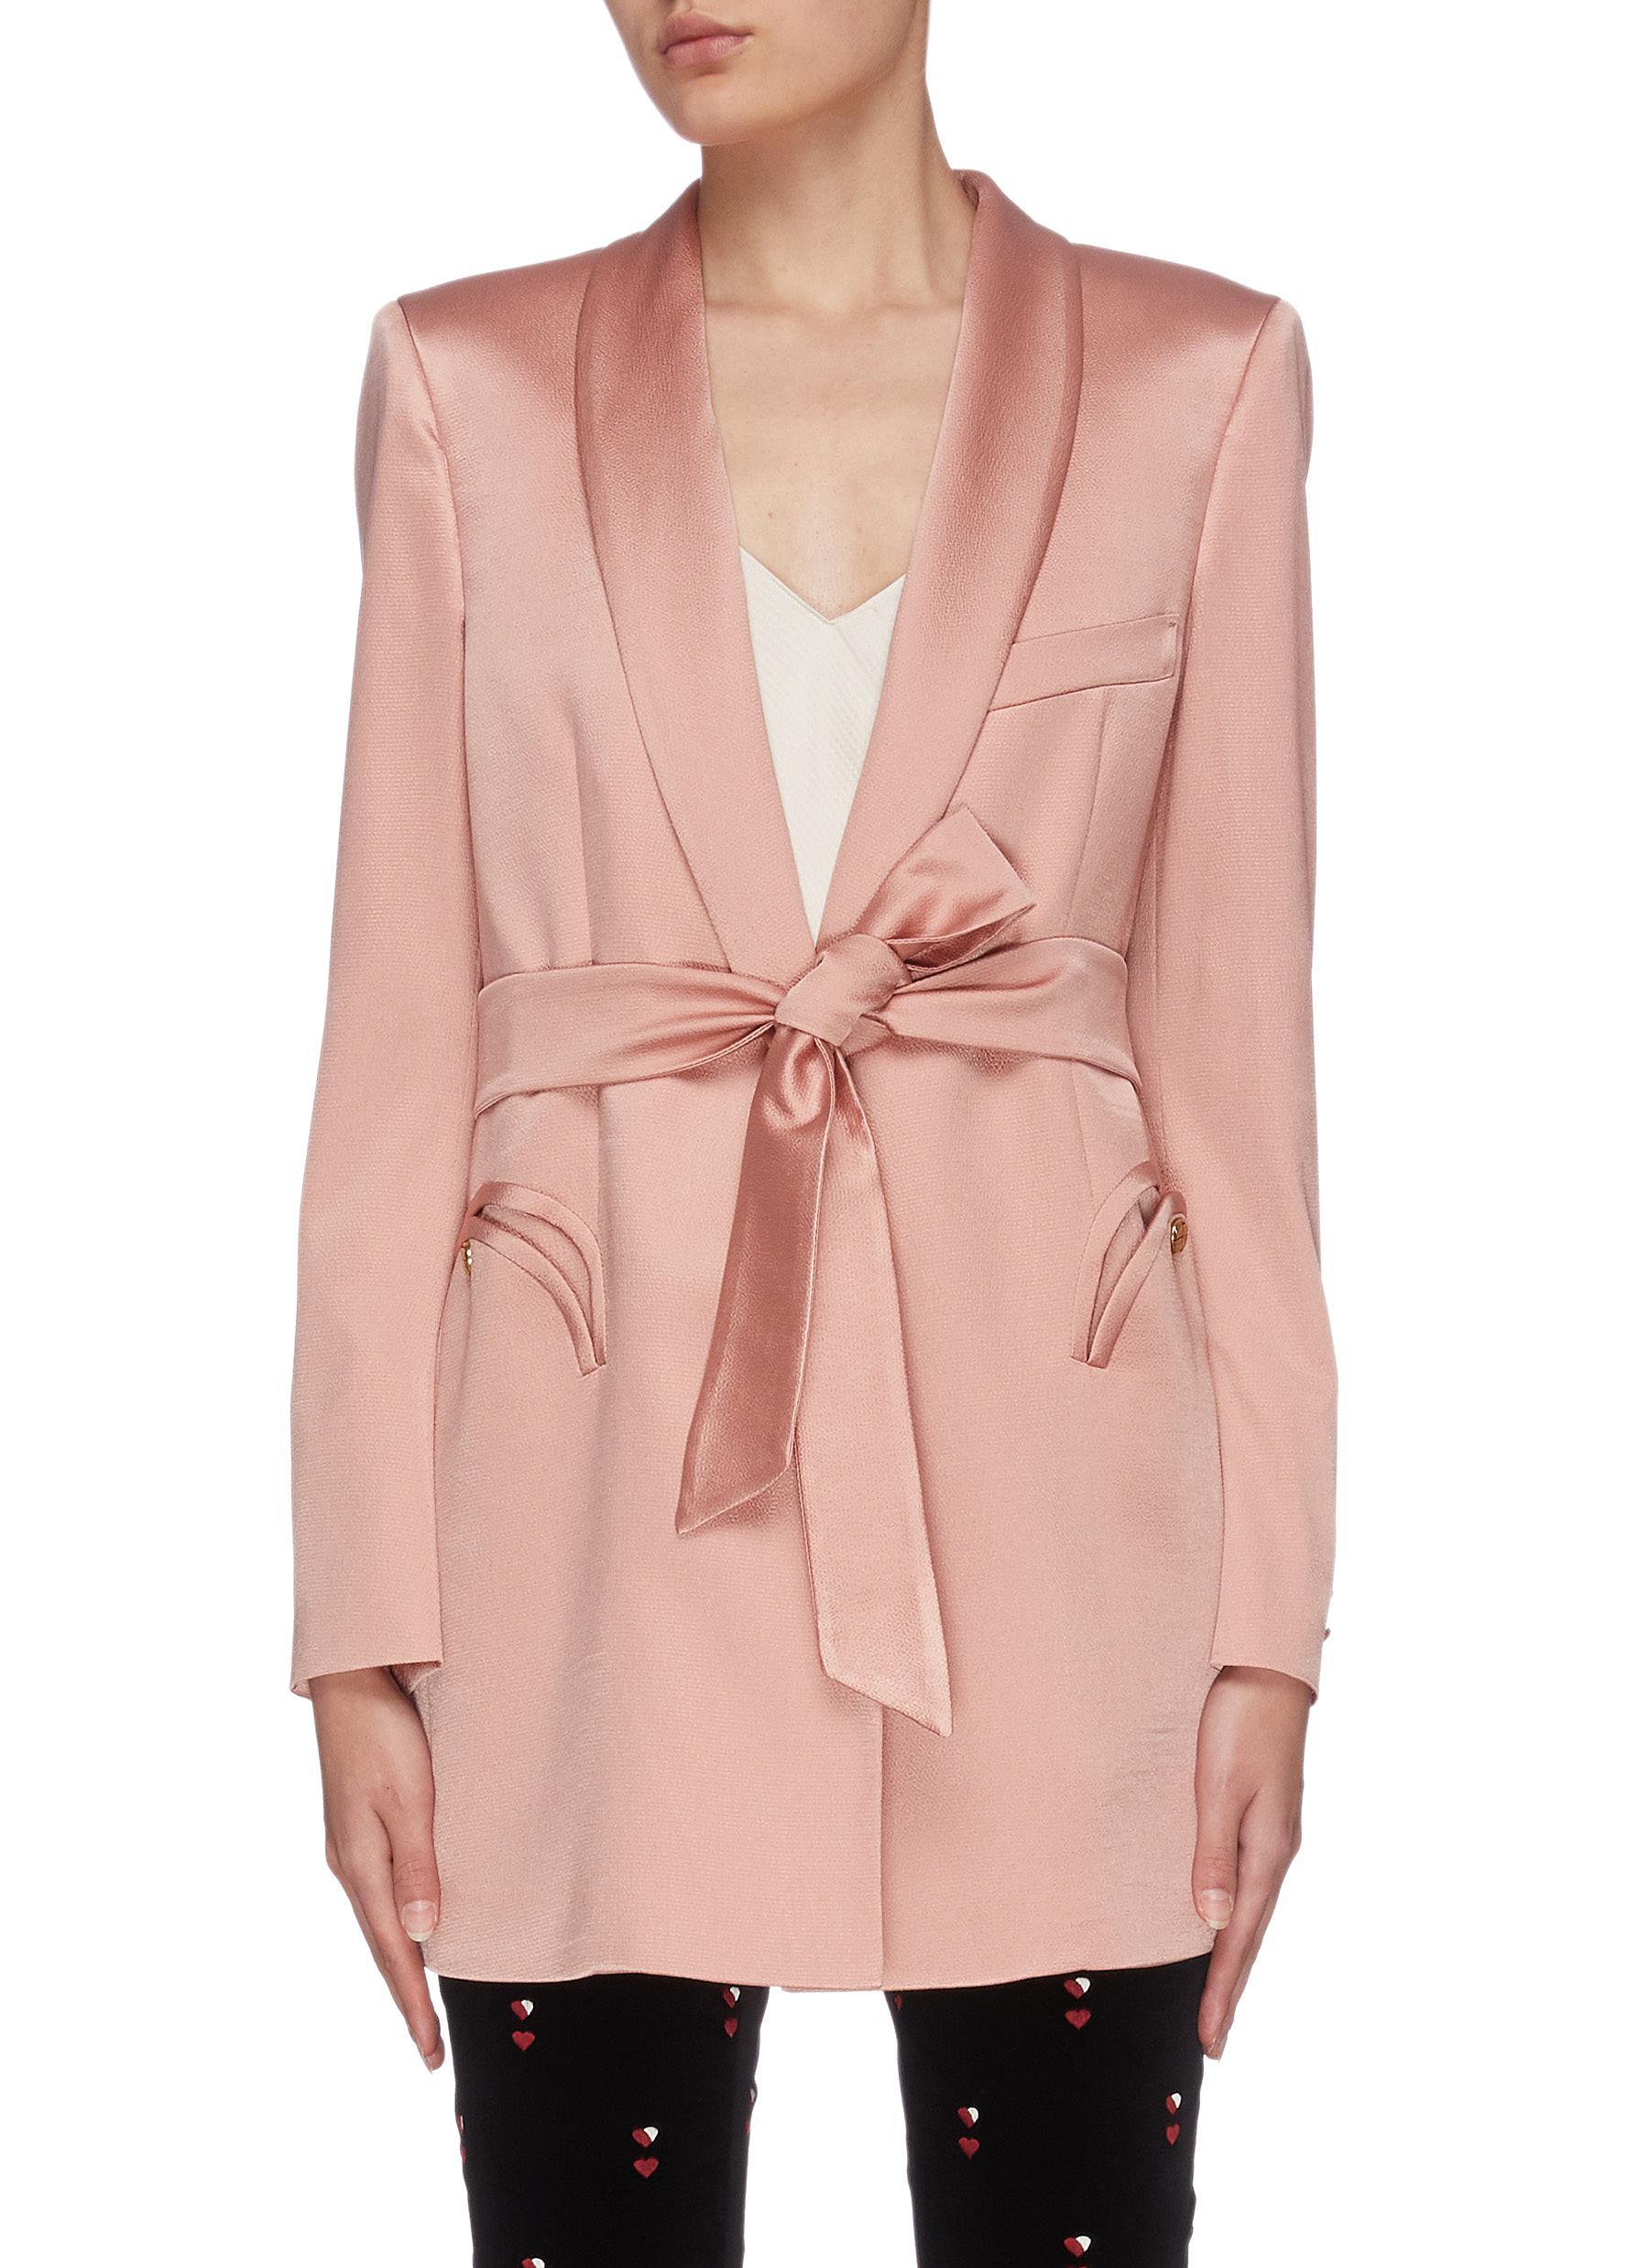 Buy Blazé Milano Blazers 'Athena Blush' sash tie blazer